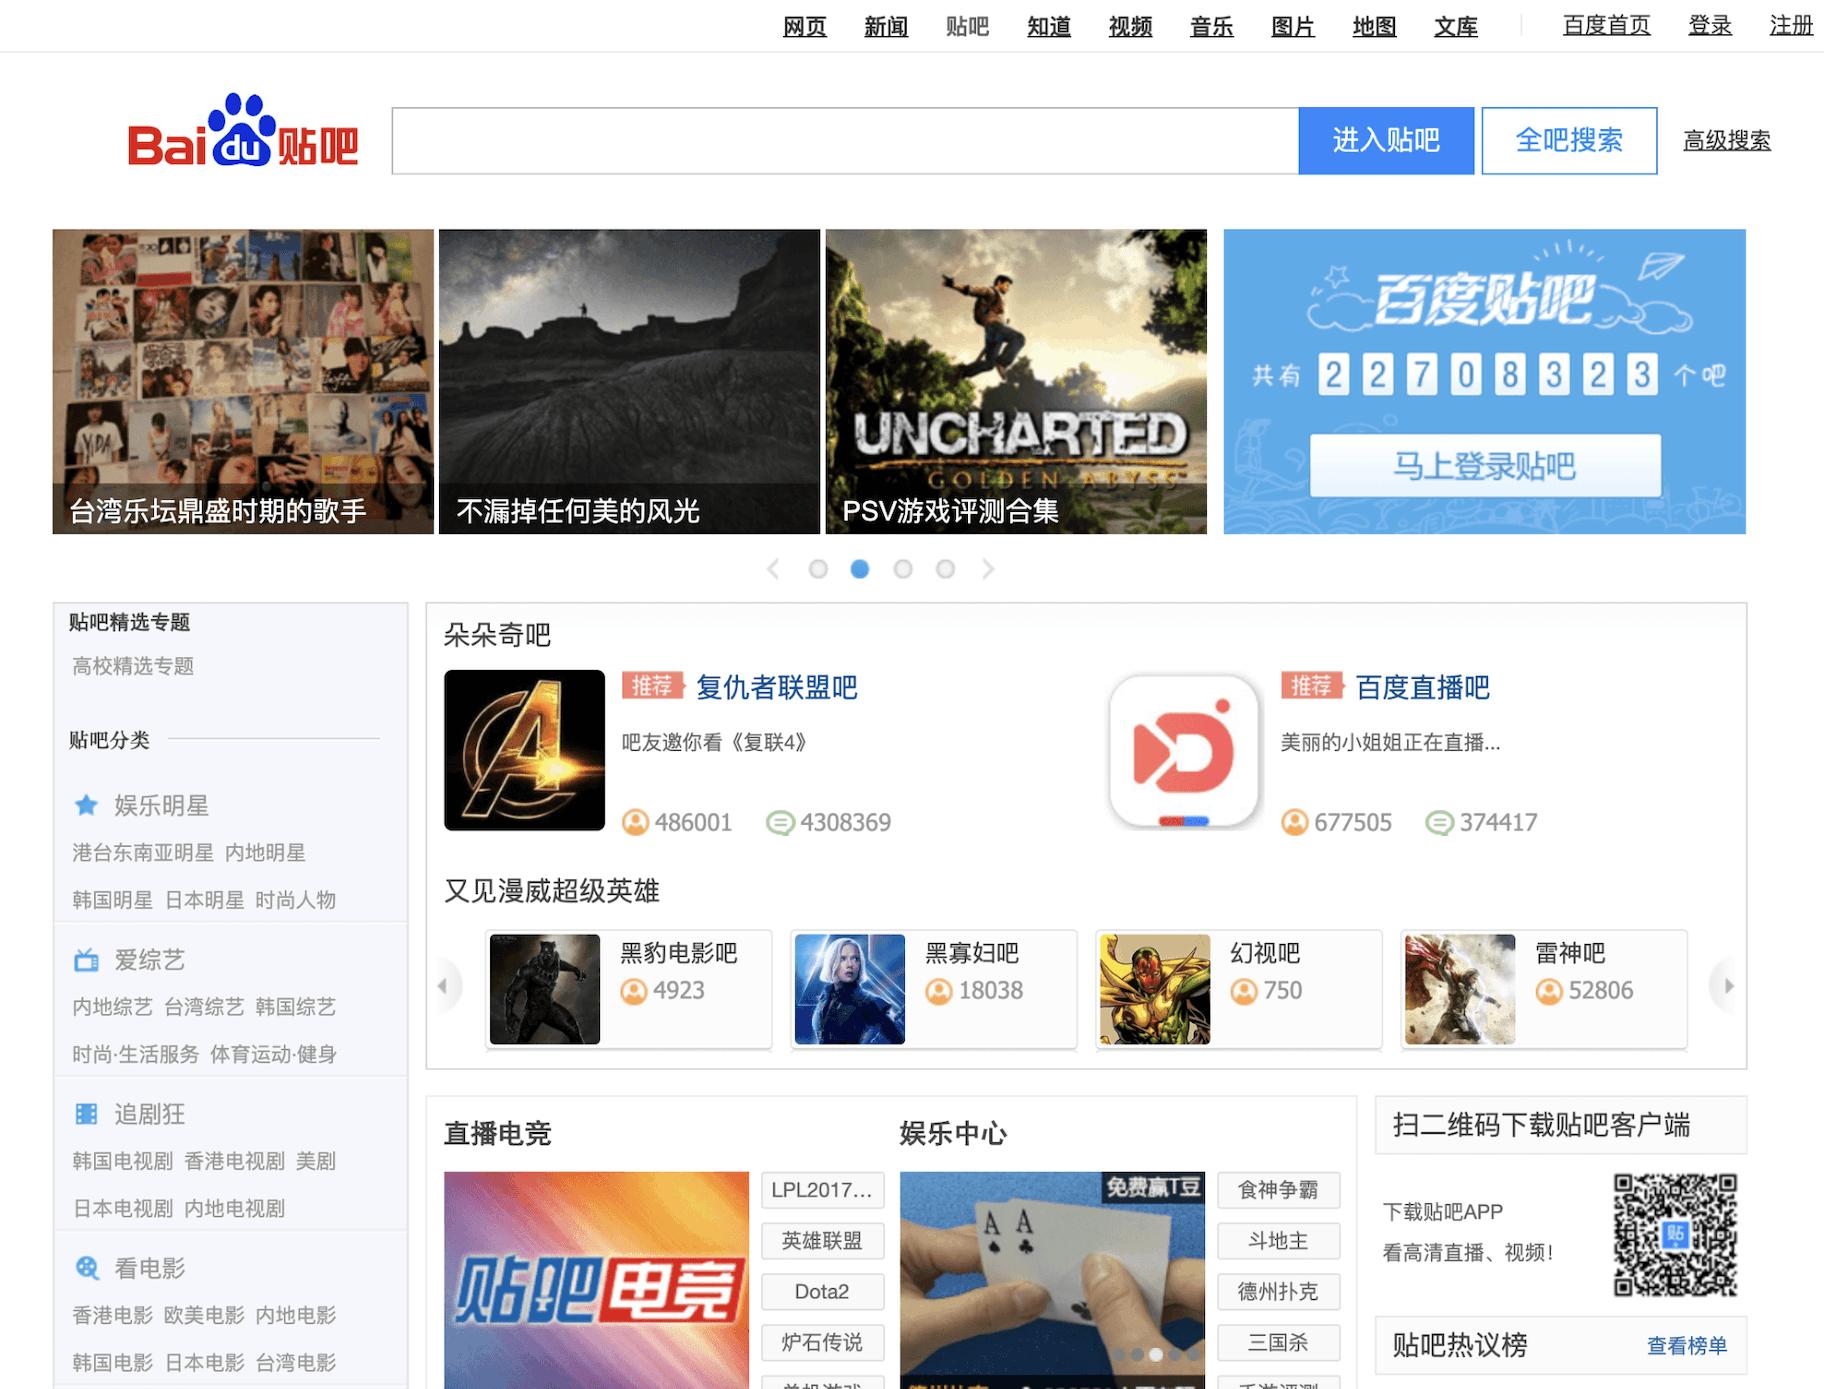 Baidu Social Media Sites